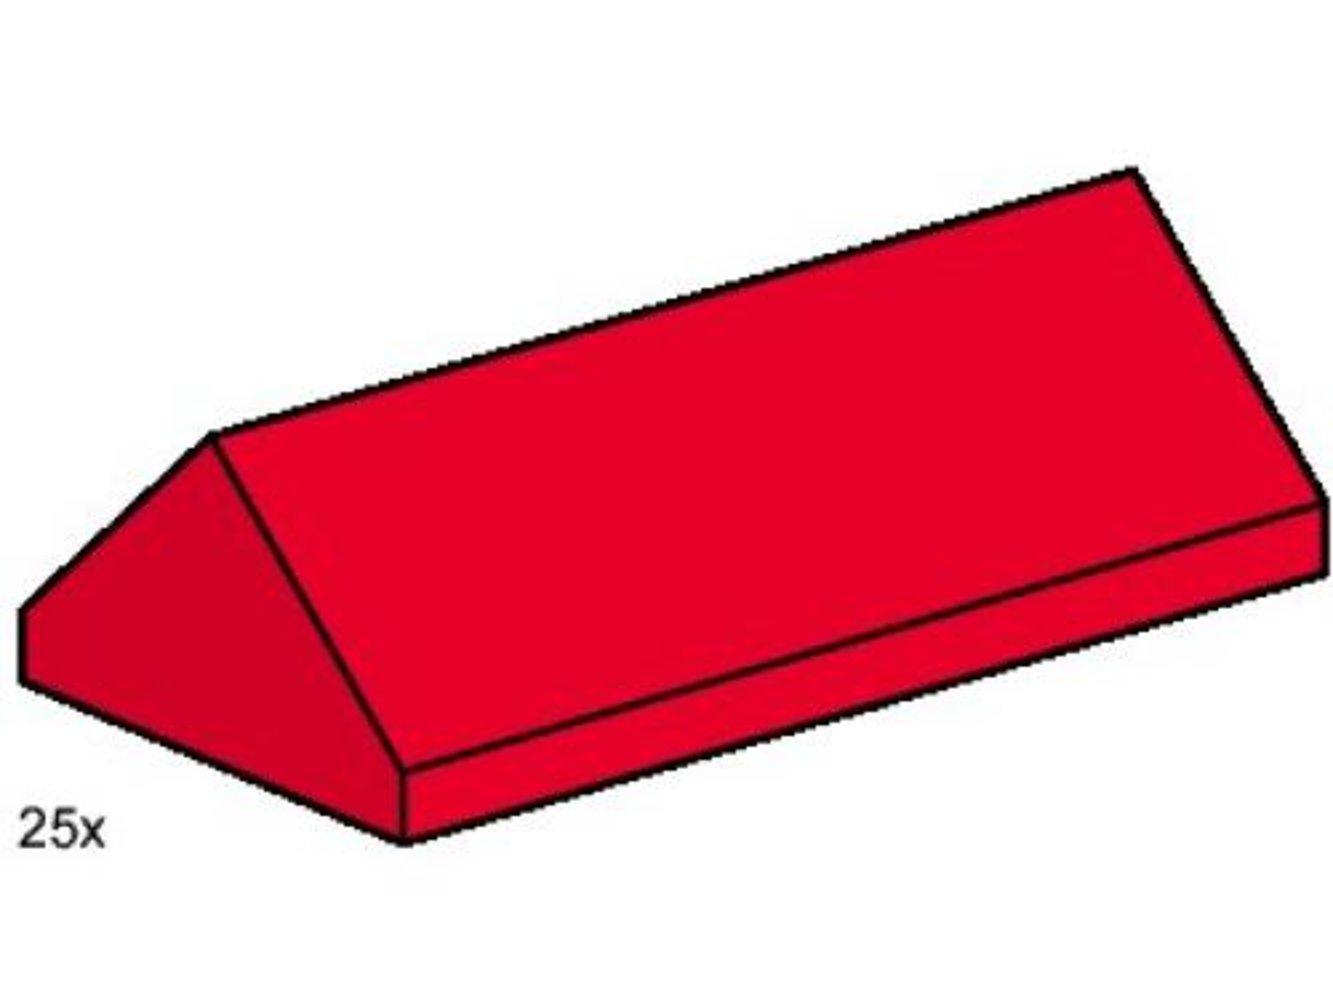 2 x 4 Ridge Roof Tiles Steep Sloped Red